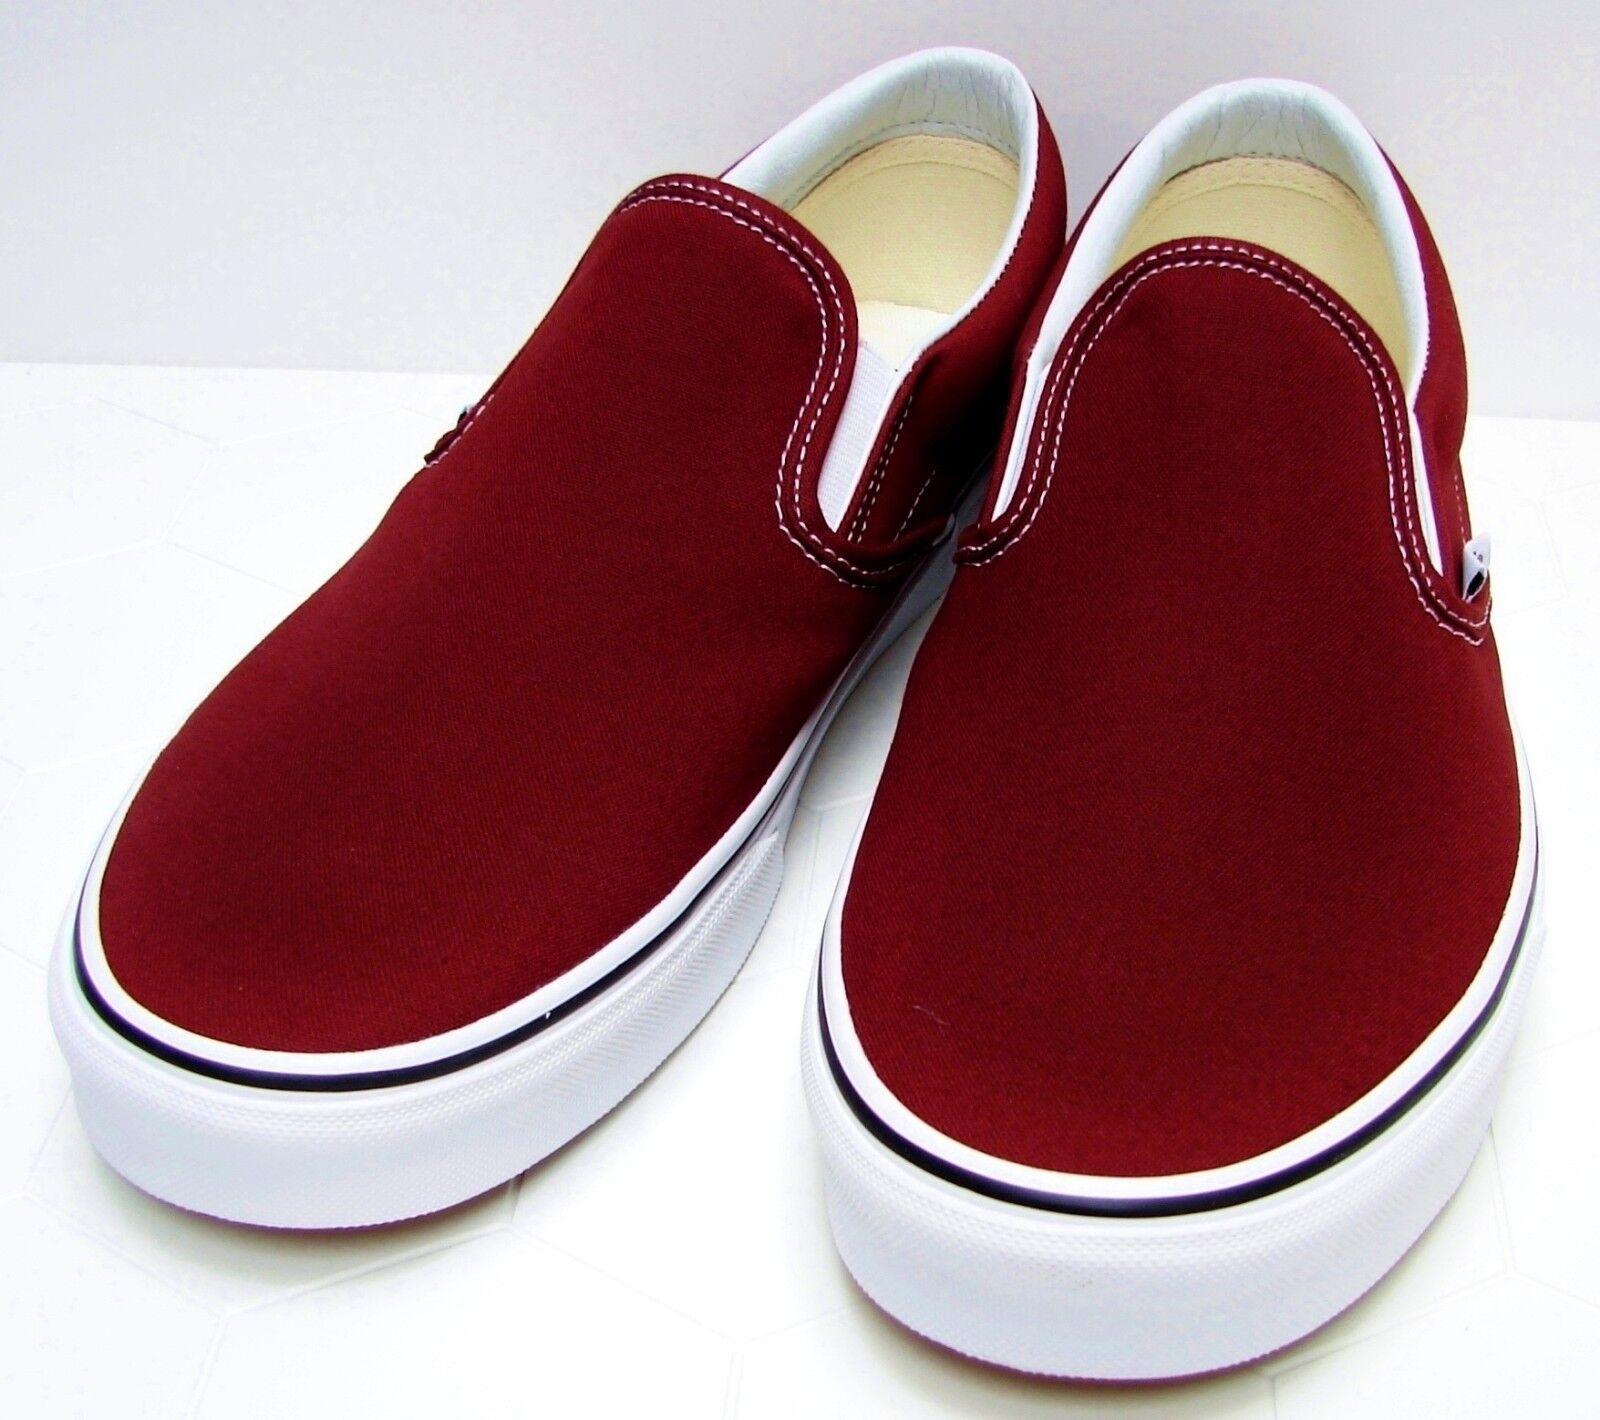 VANS Classic Slip-On Madder Brown True White VN-0A38F7OVK Men's size  10